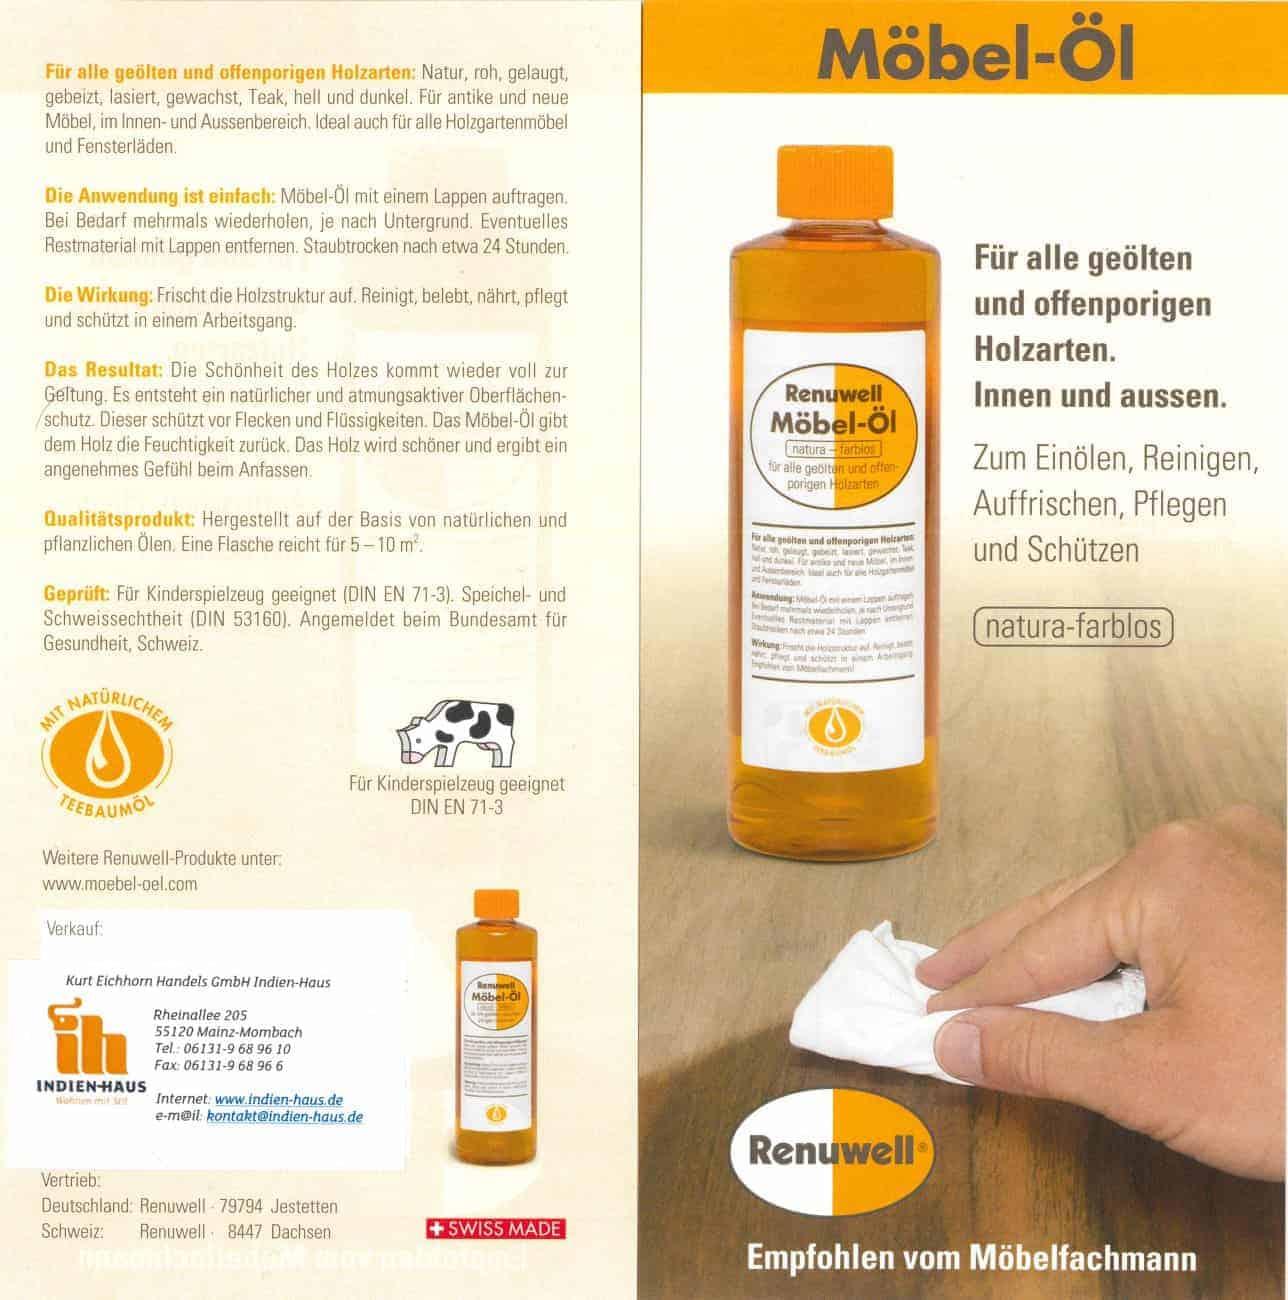 Renuwell Möbel-Öl - #Indien-Haus